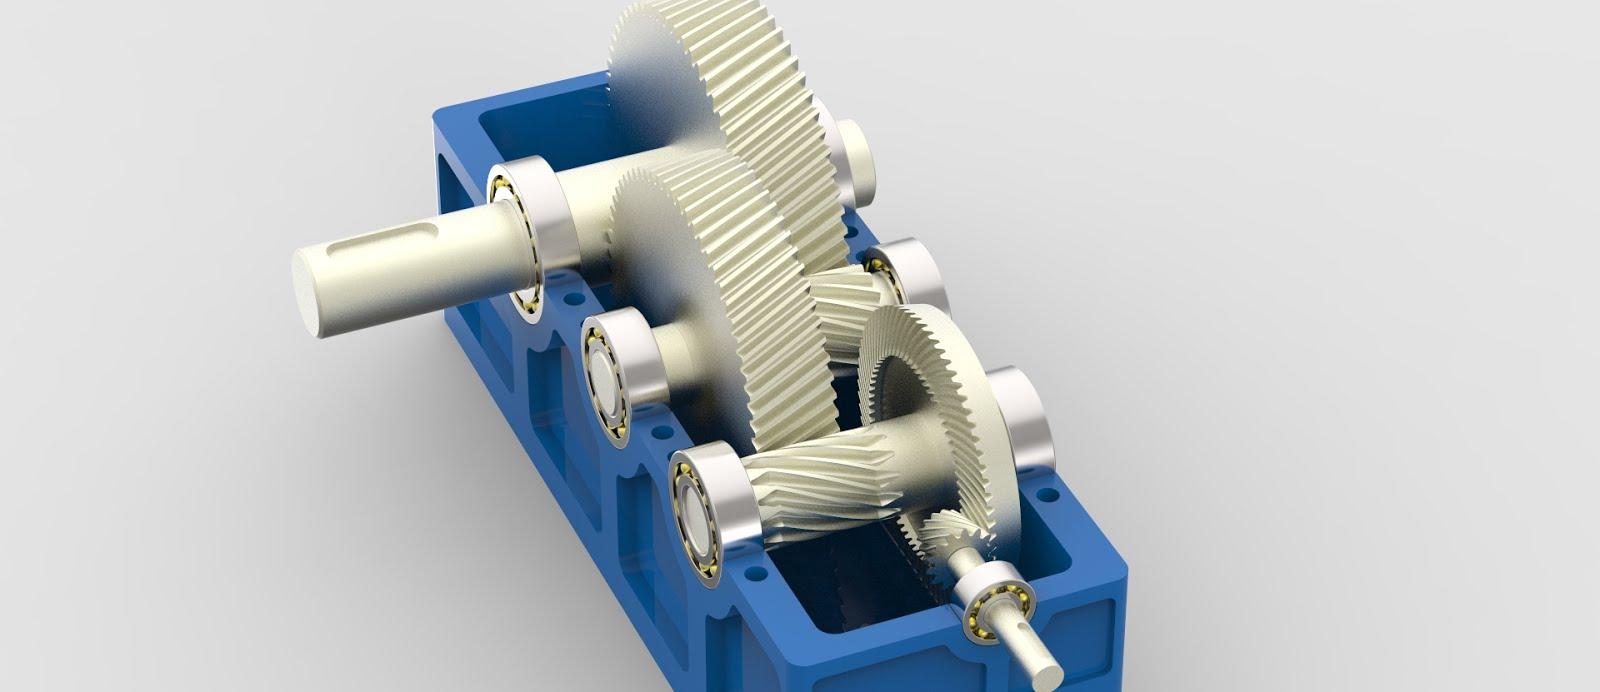 S Amp B Cad Design Reductor De Velocidad